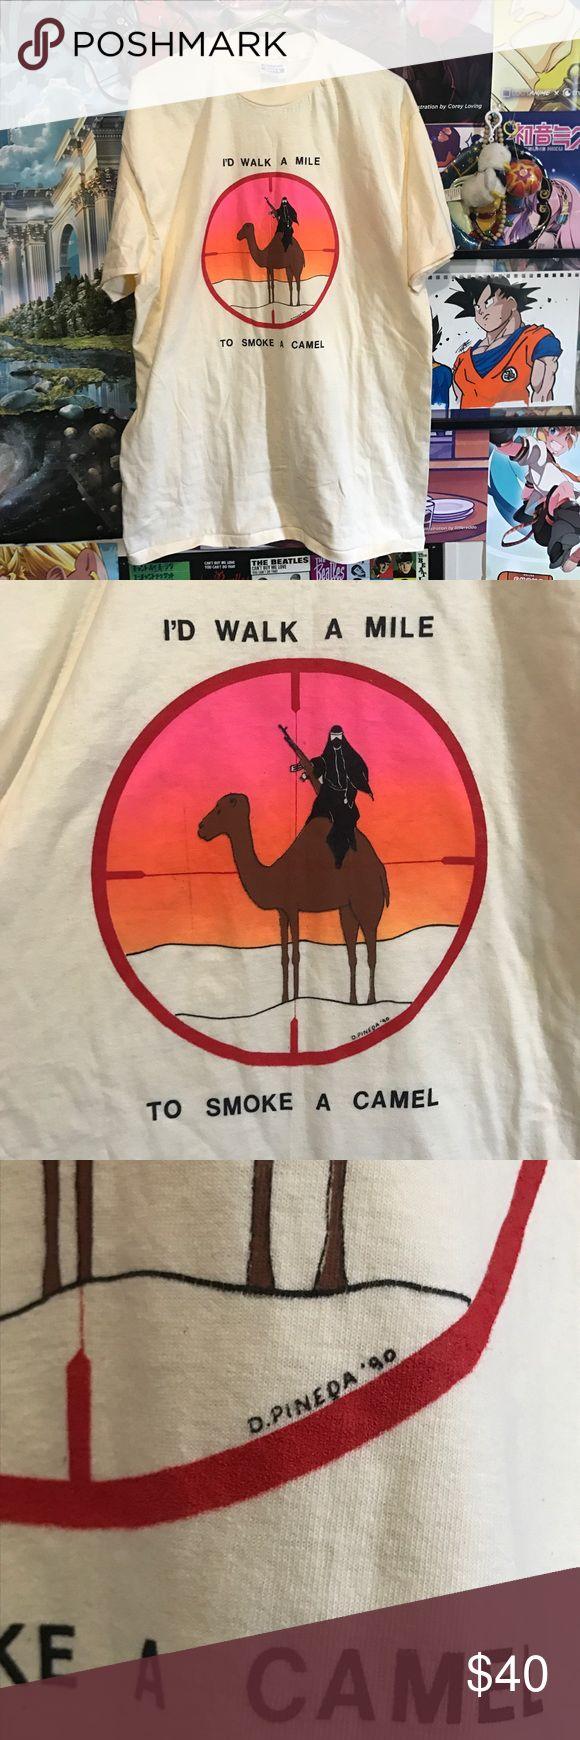 VTG Camel T-Shirt Vintage I'd walk a mile to smoke a camel tee! Size XL 10/10 Vintage Tops Tees - Short Sleeve